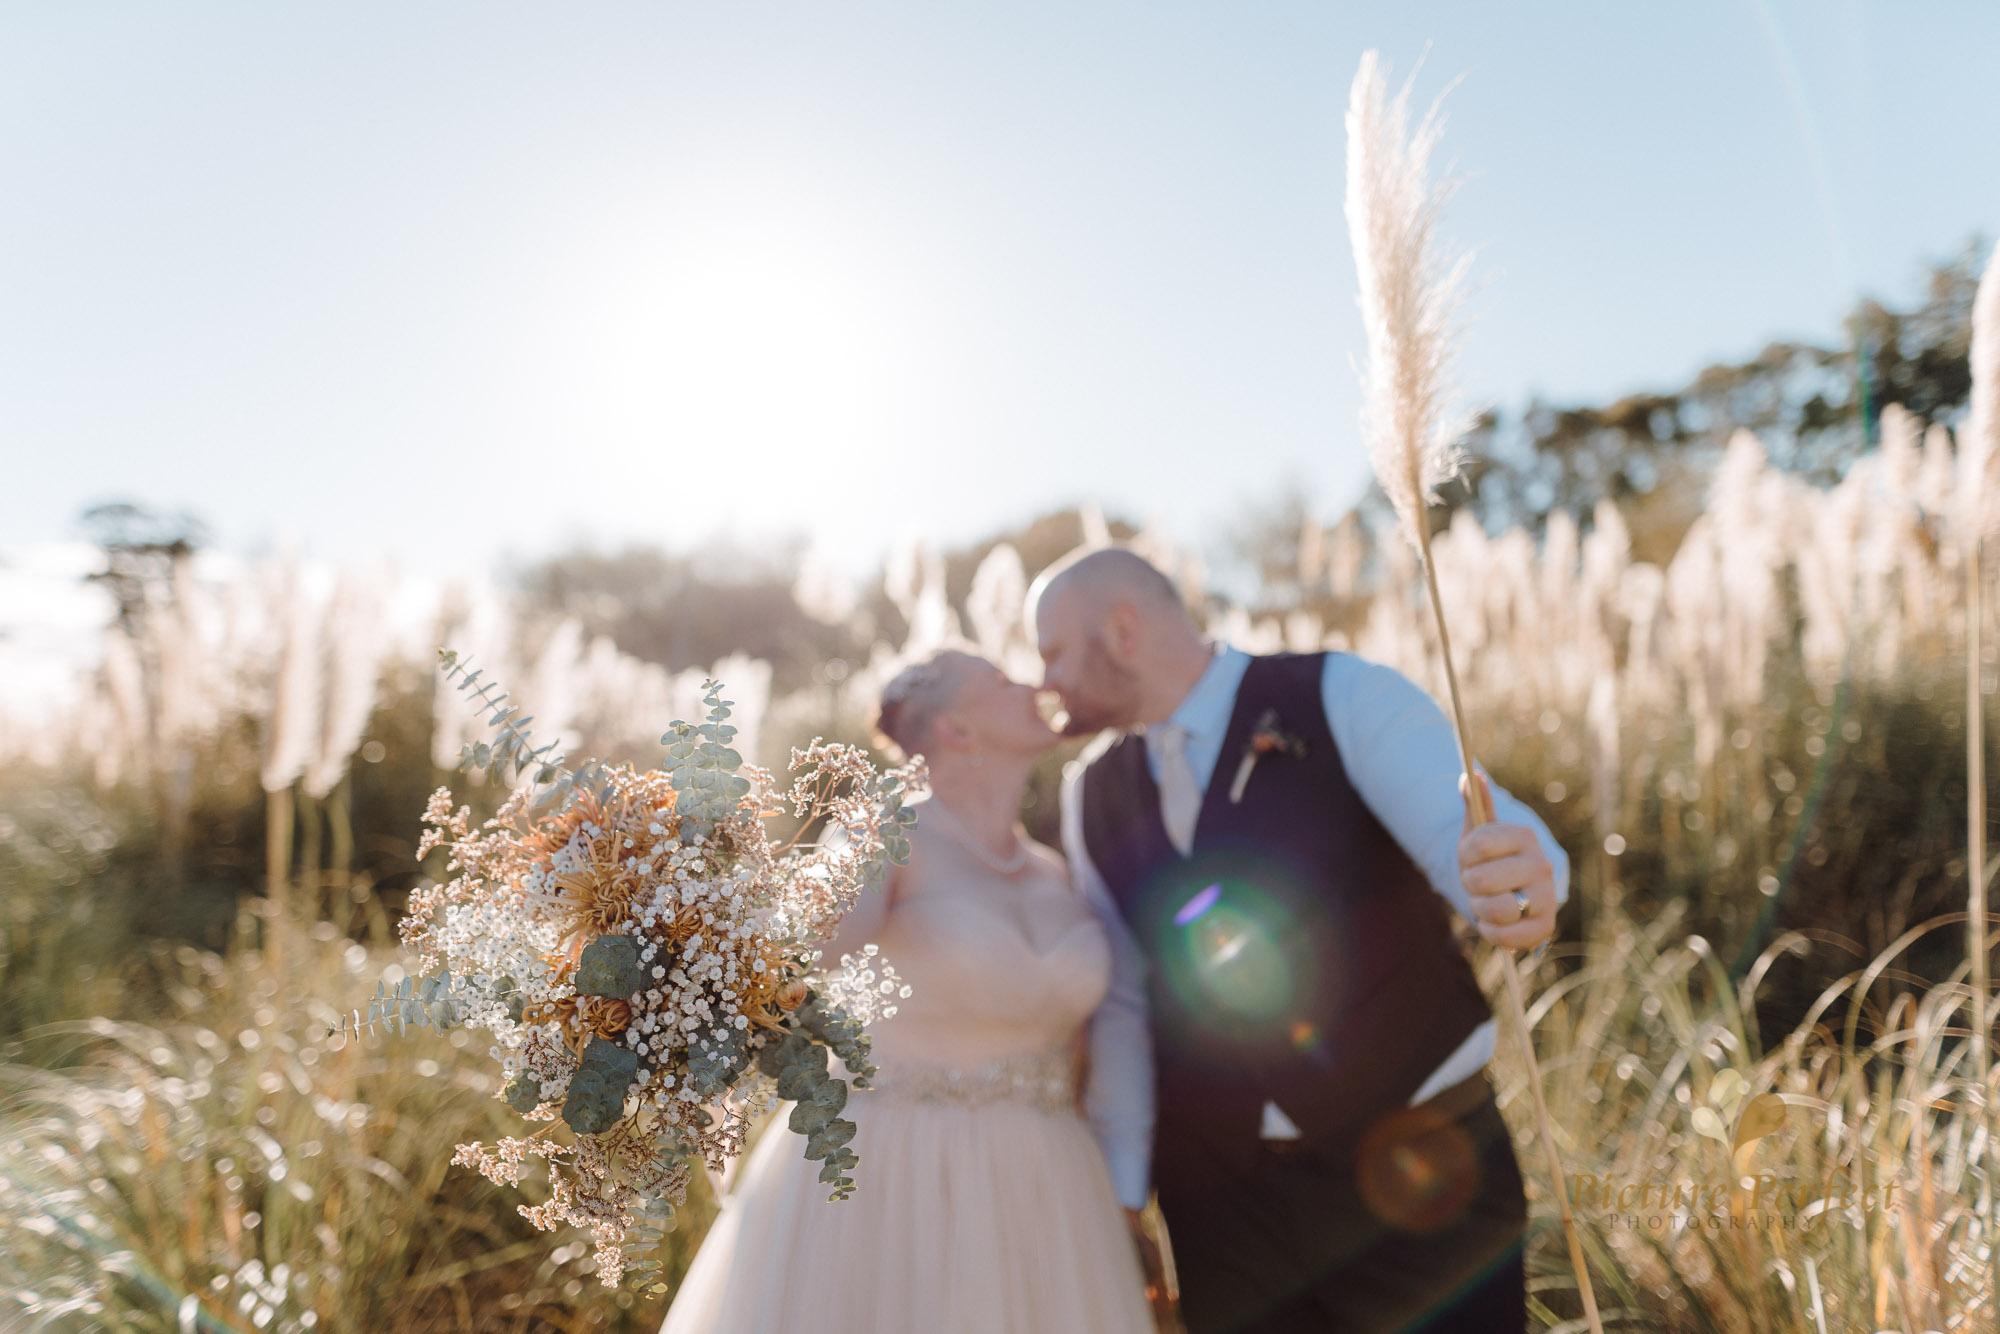 Manawatu beach bridal photography during golden hour with Tina 0042